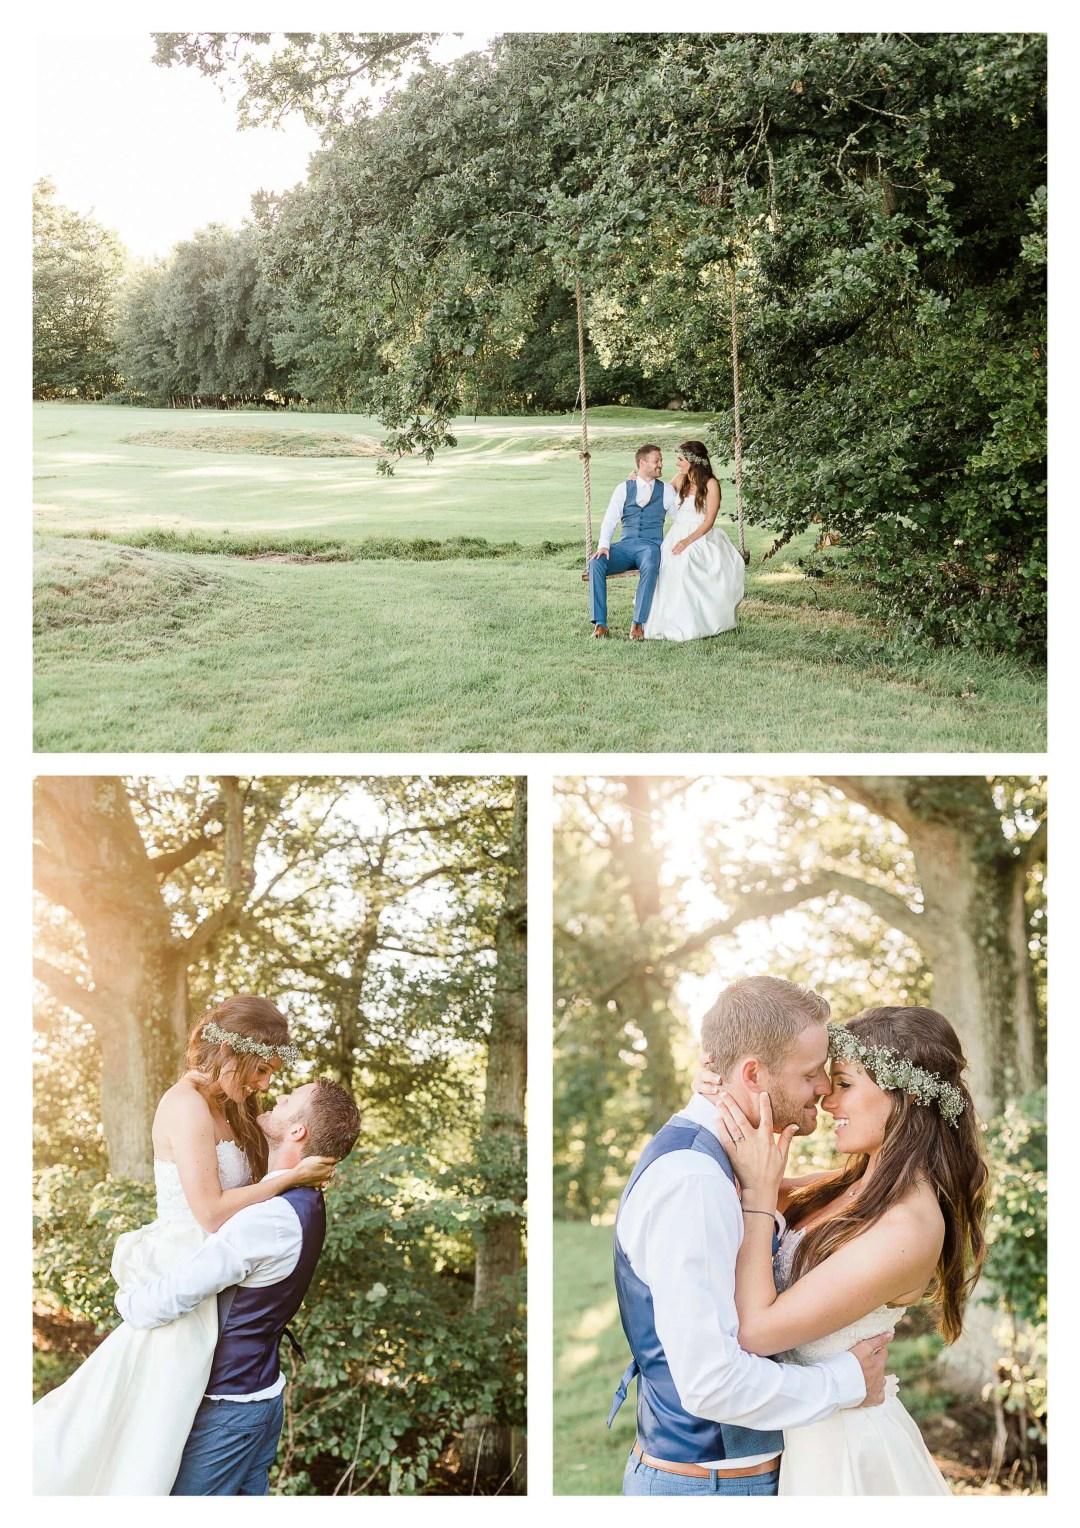 Brookfield Barn swing wedding photography | Horsham photographer